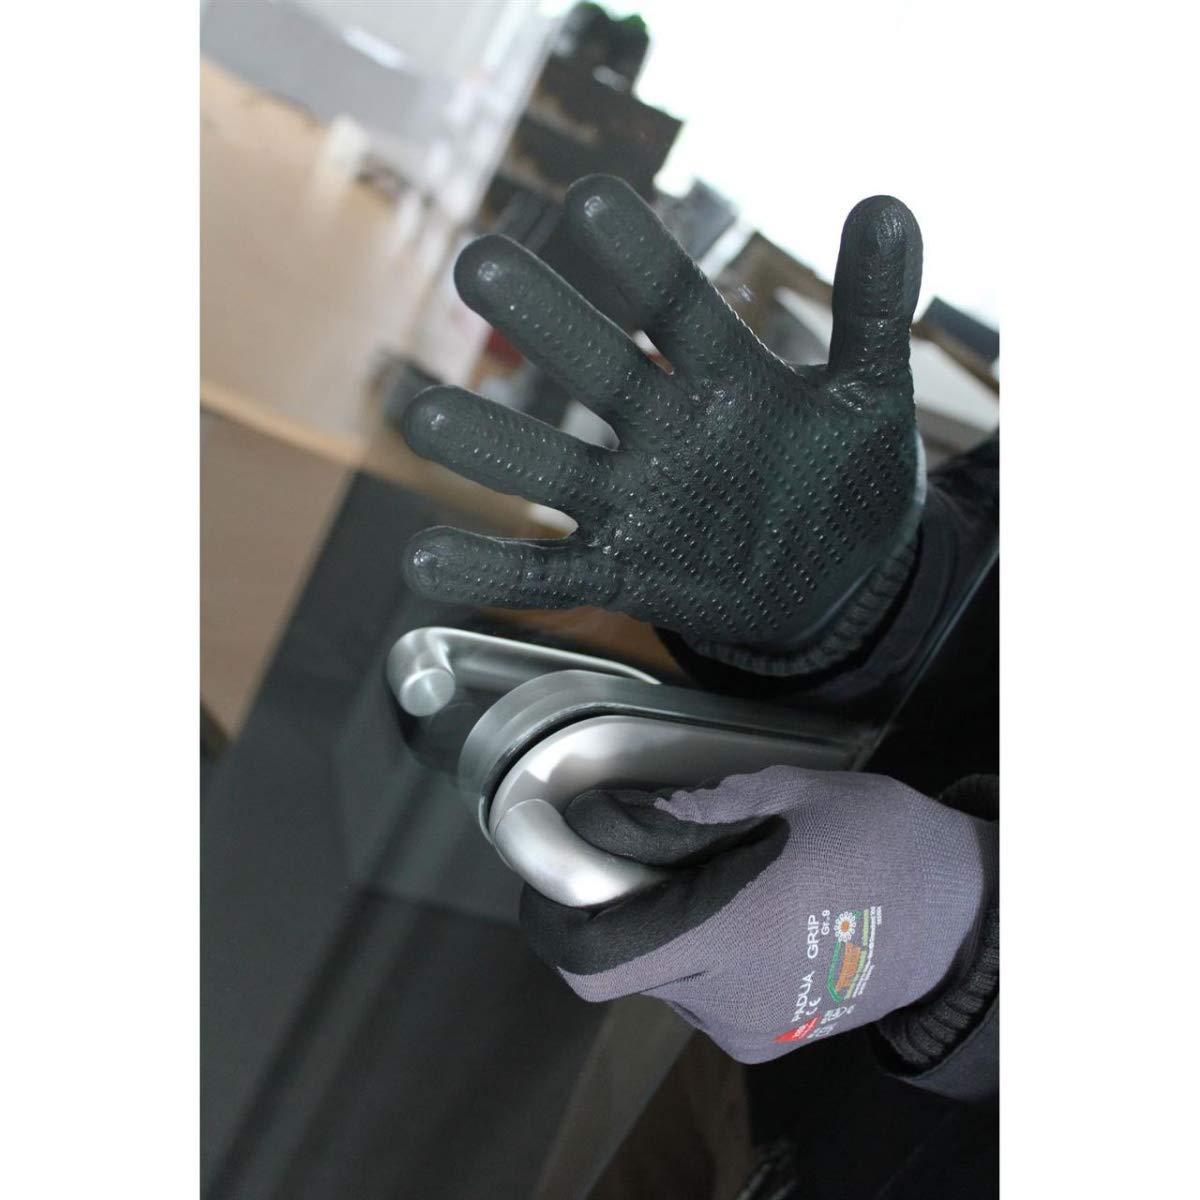 10 Paar Hase Safety Padua Grip Nitril-Arbeitshandschuhe Rutschfeste Mechaniker-Handschuhe Gr/ö/ße XS 06